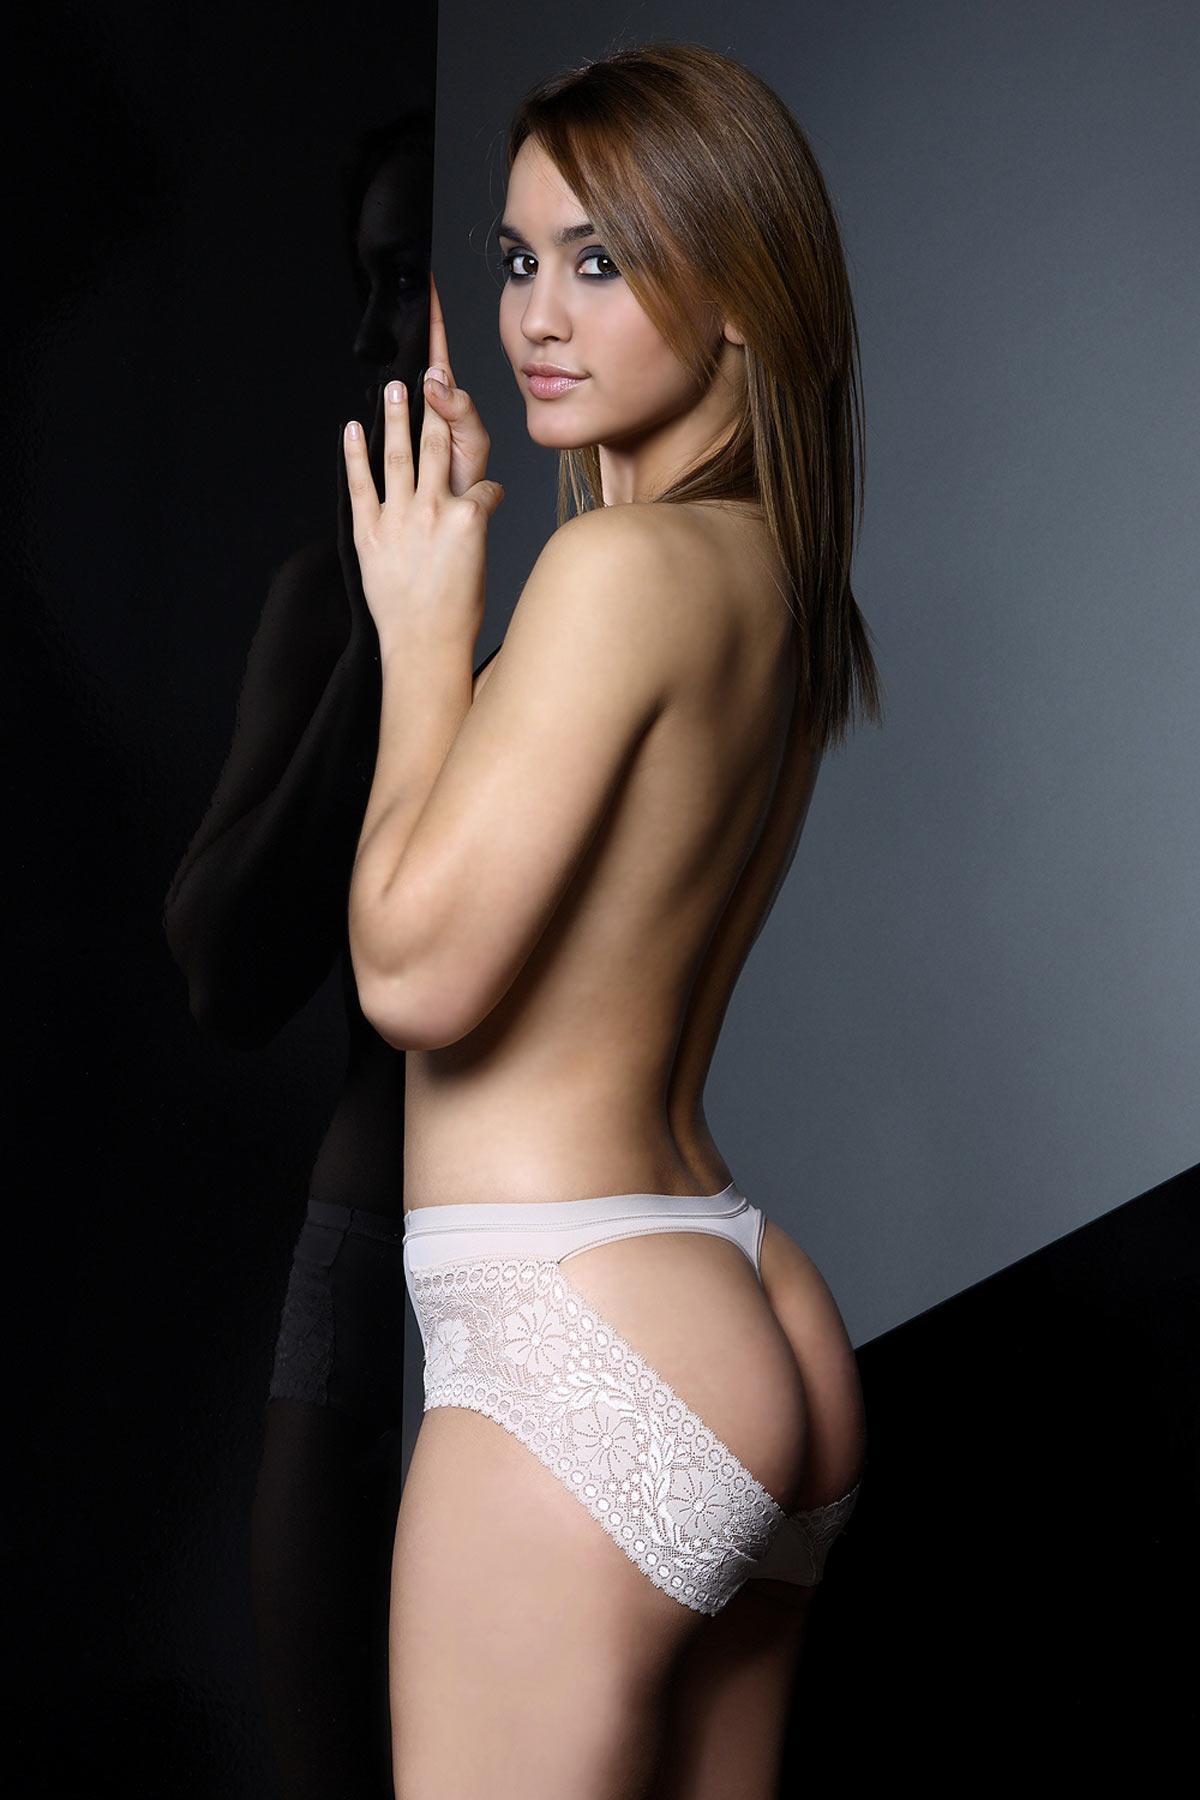 Меган Монтанер фото испанская актриса Megan Montaner photo